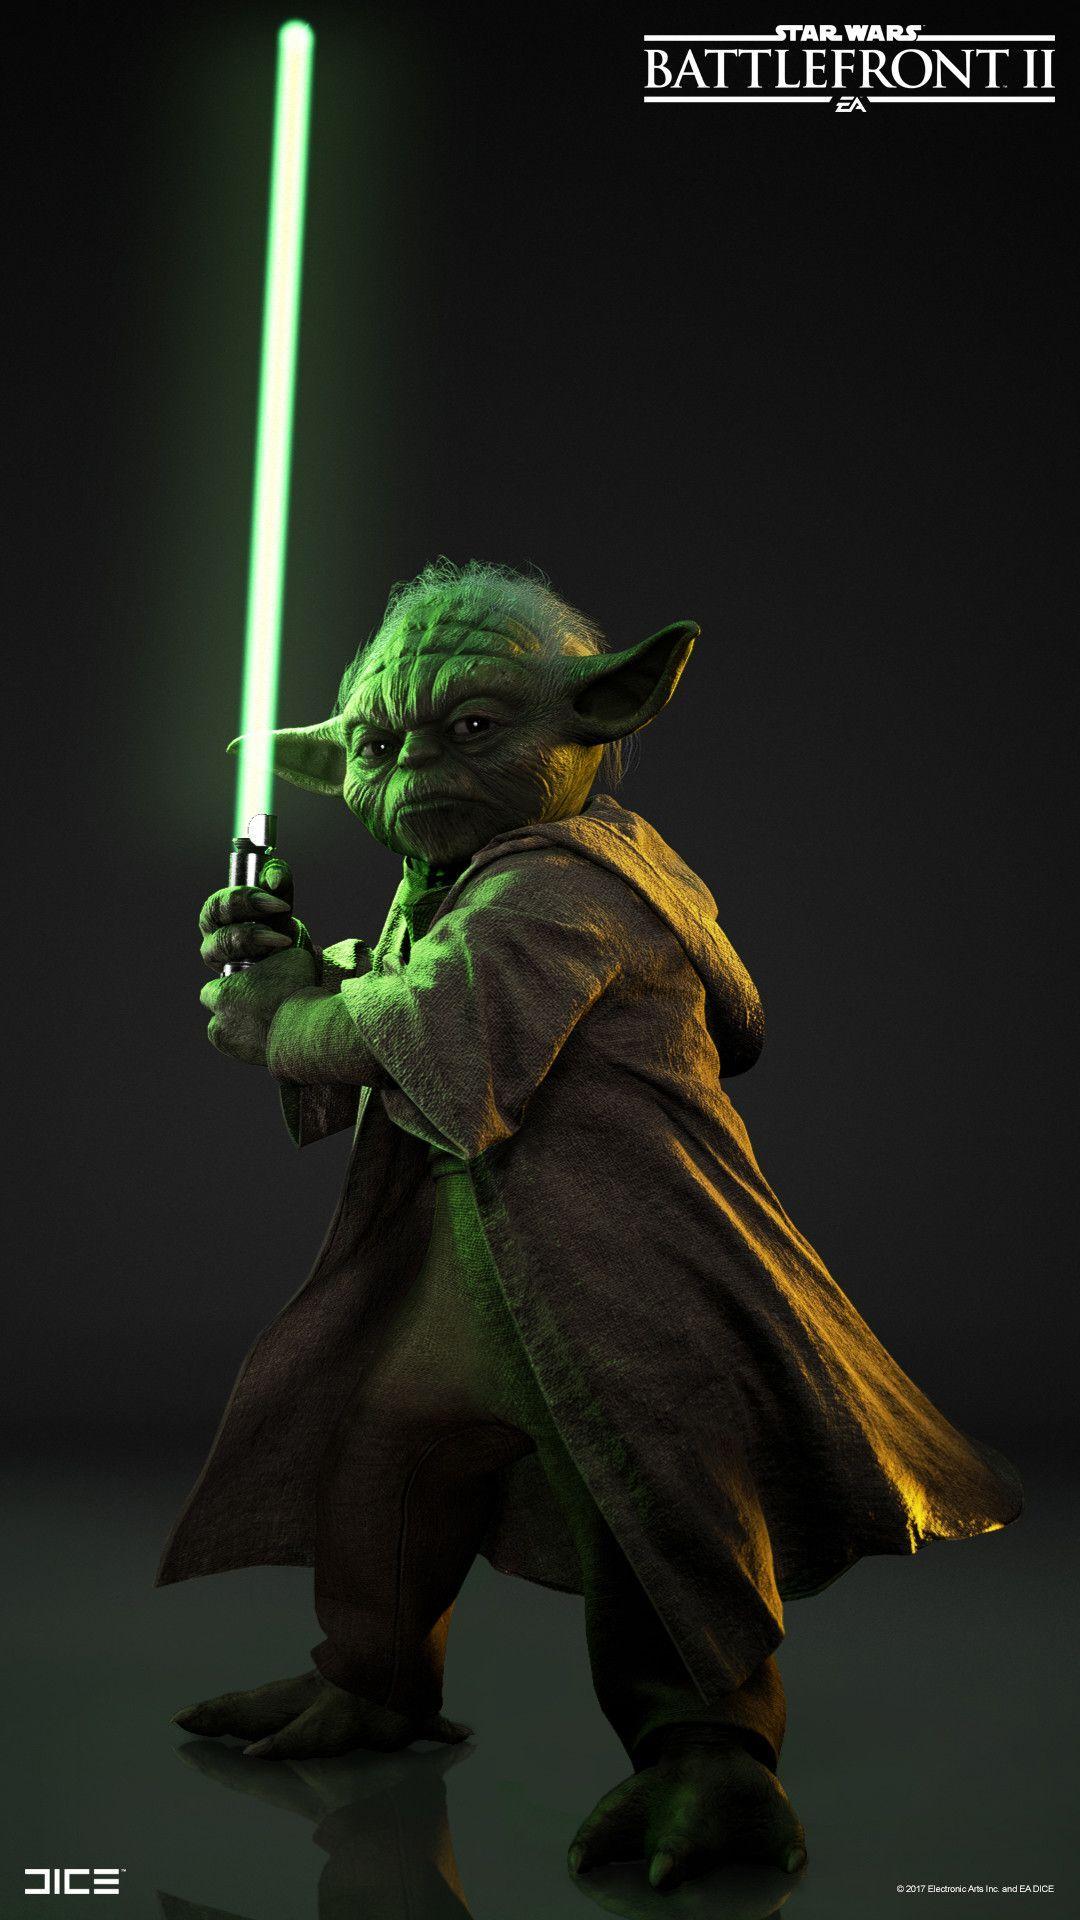 Ultra Hd Yoda Wallpaper Iphone